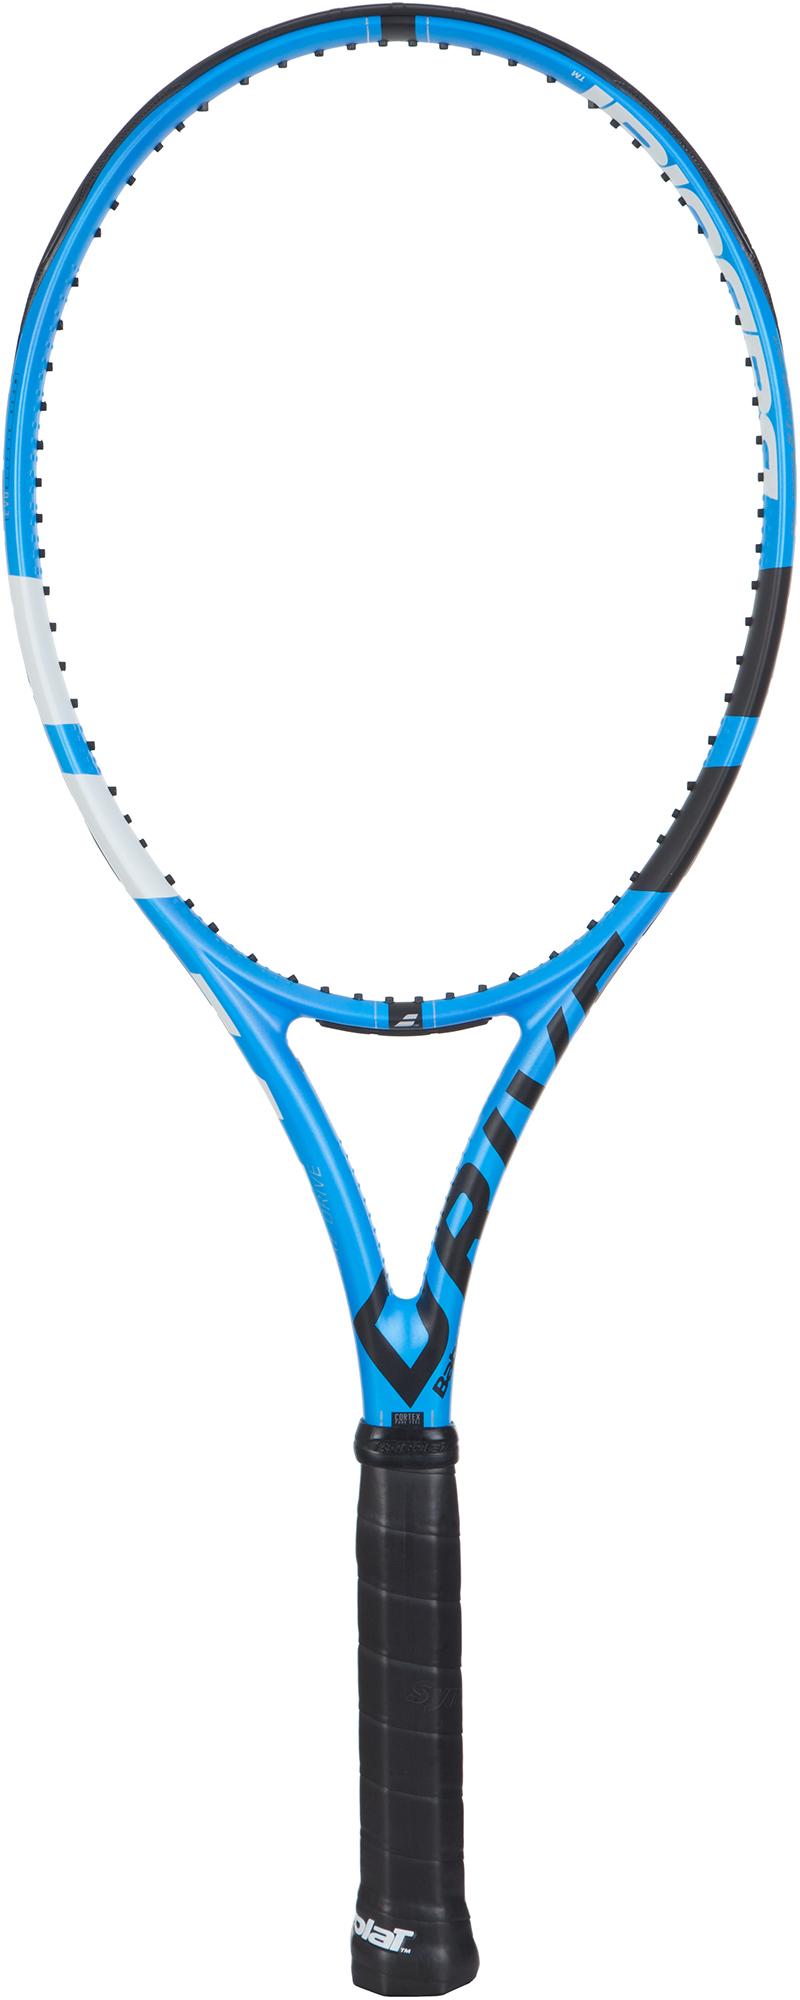 Babolat Ракетка для большого тенниса Babolat Pure Drive цена